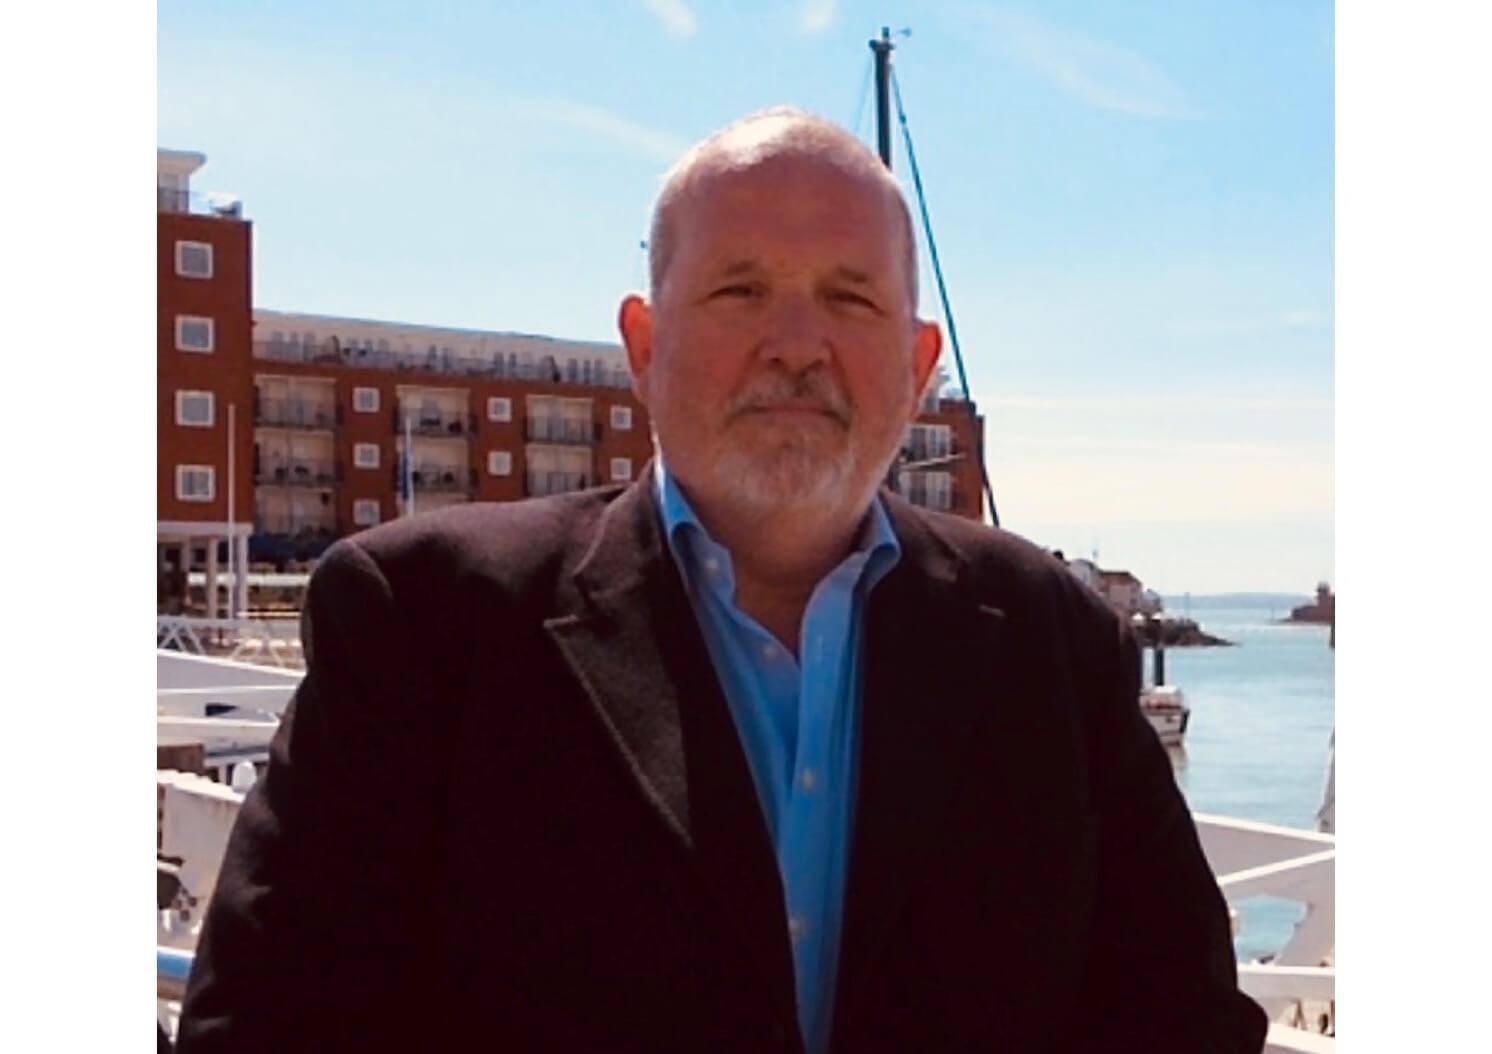 Steve Watts